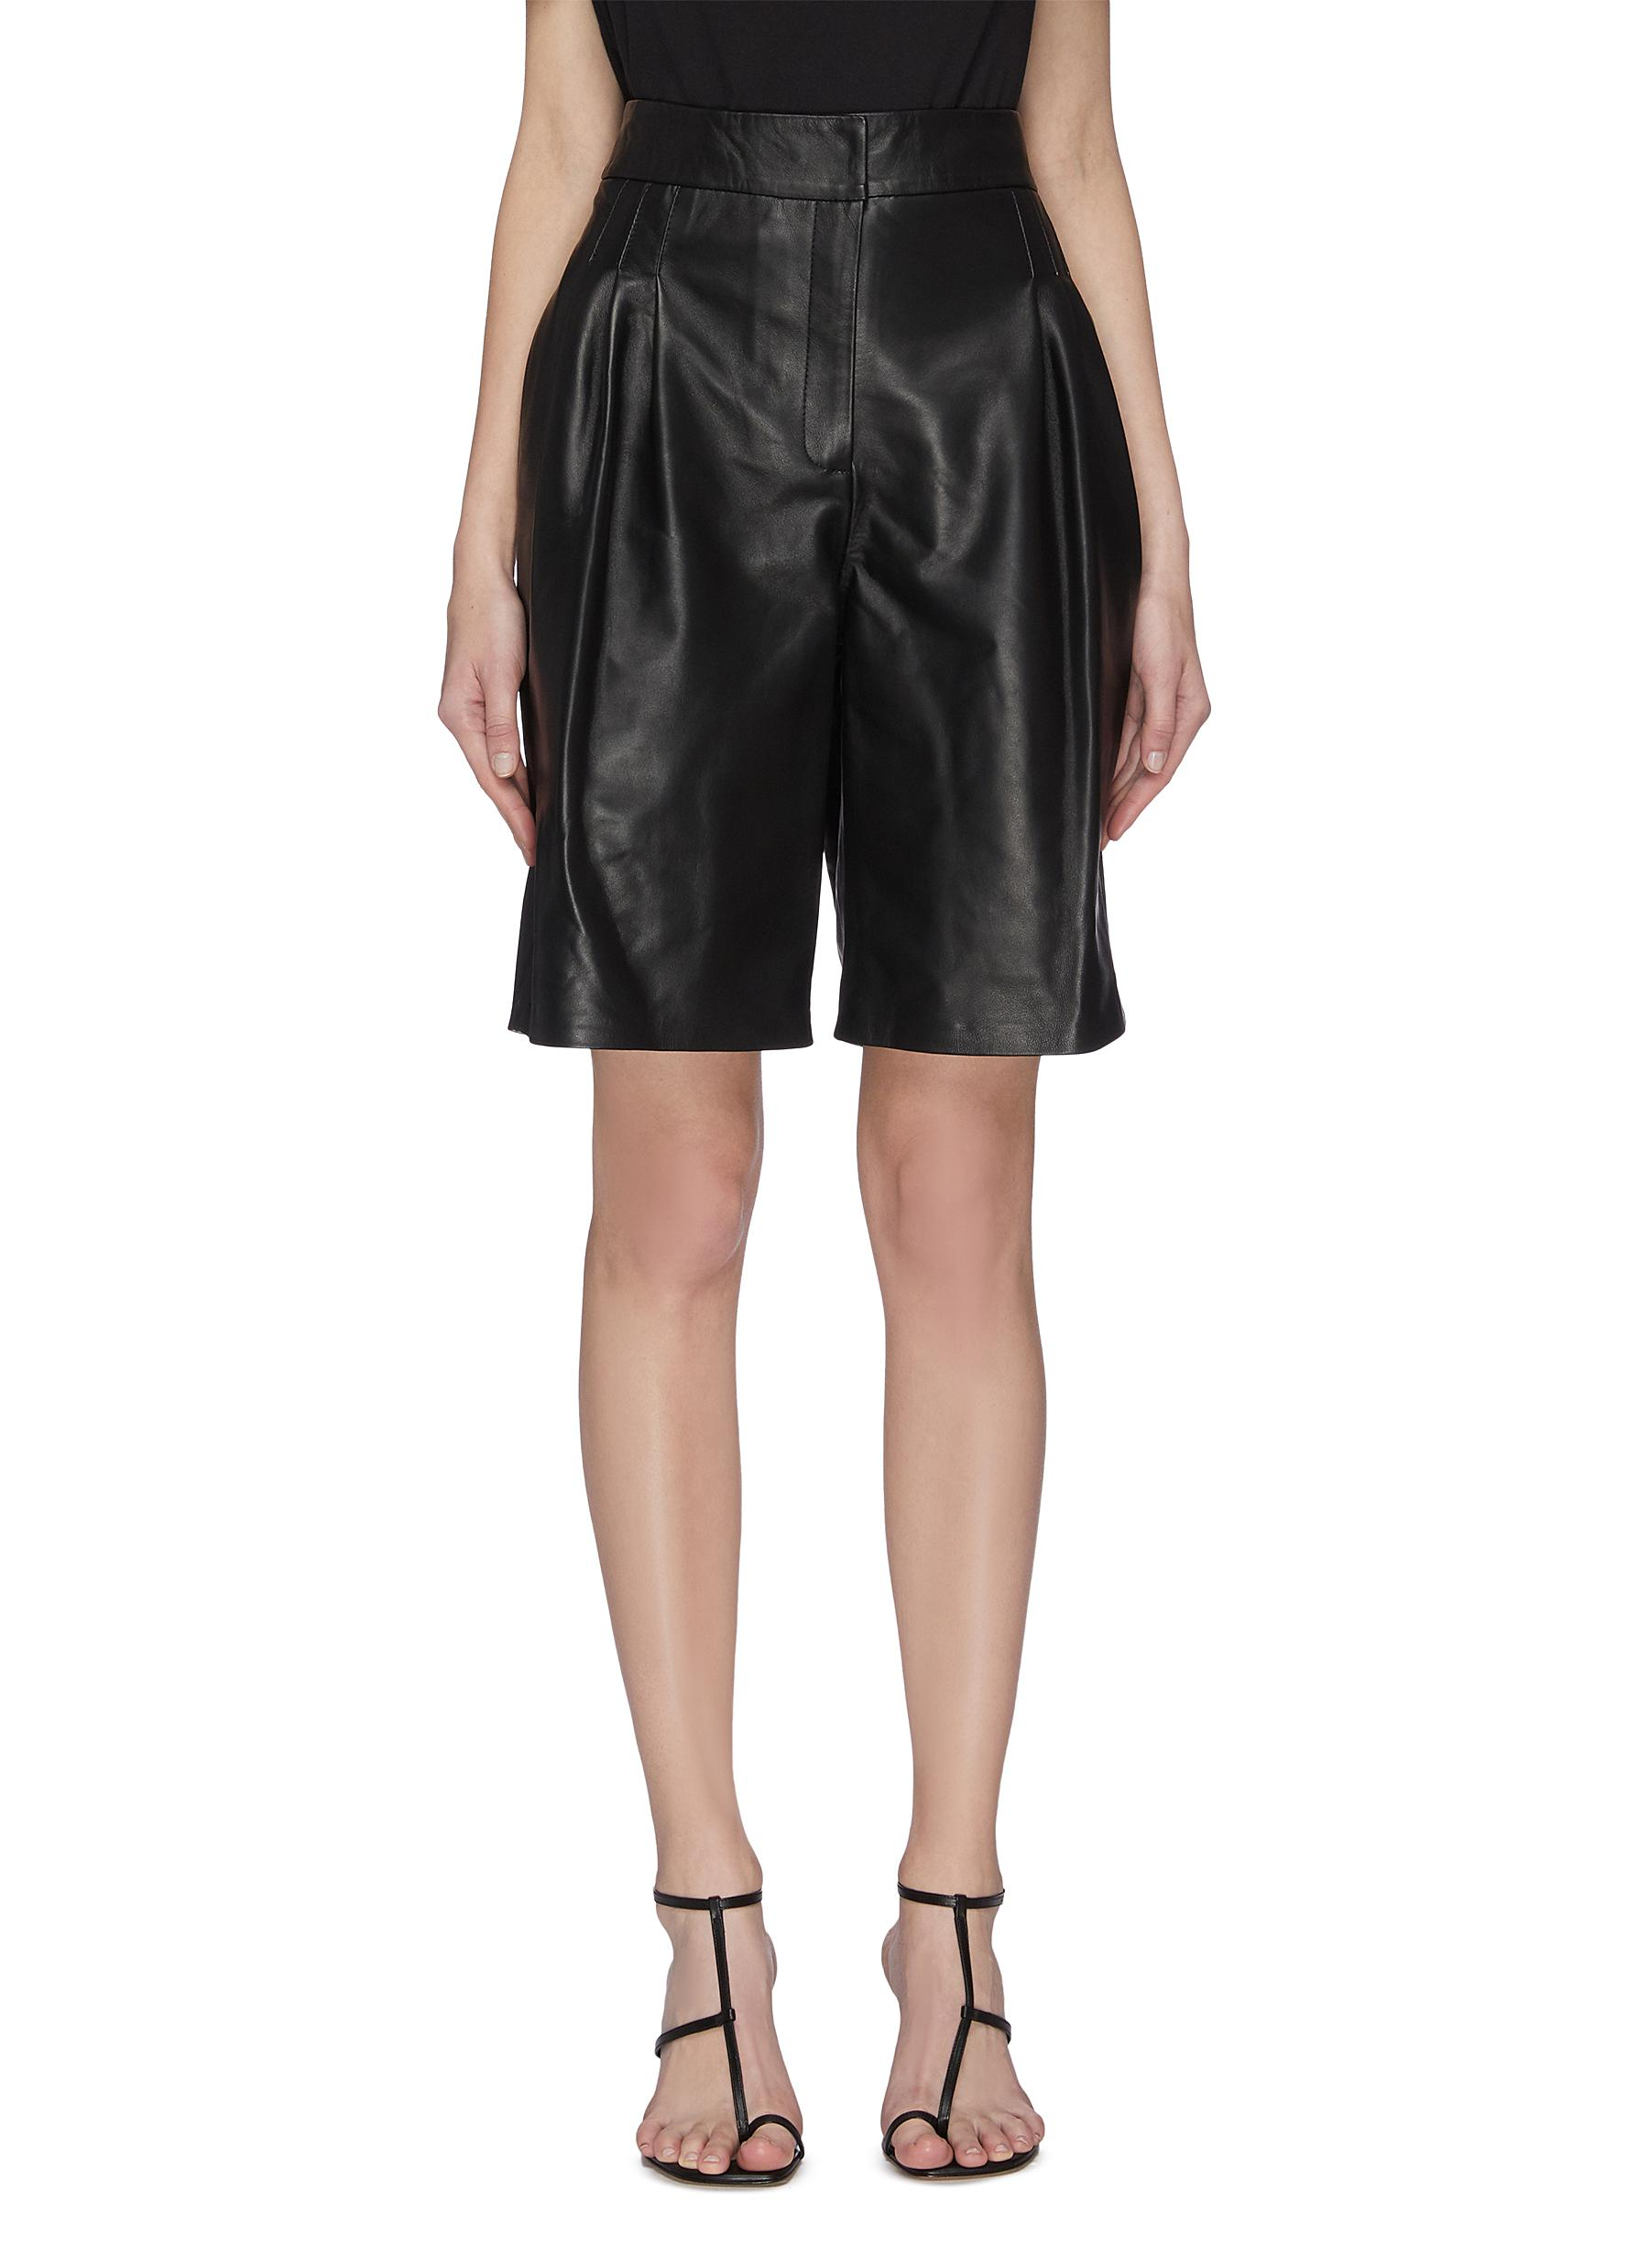 shop 16Arlington 'Grant' nappa leather shorts online